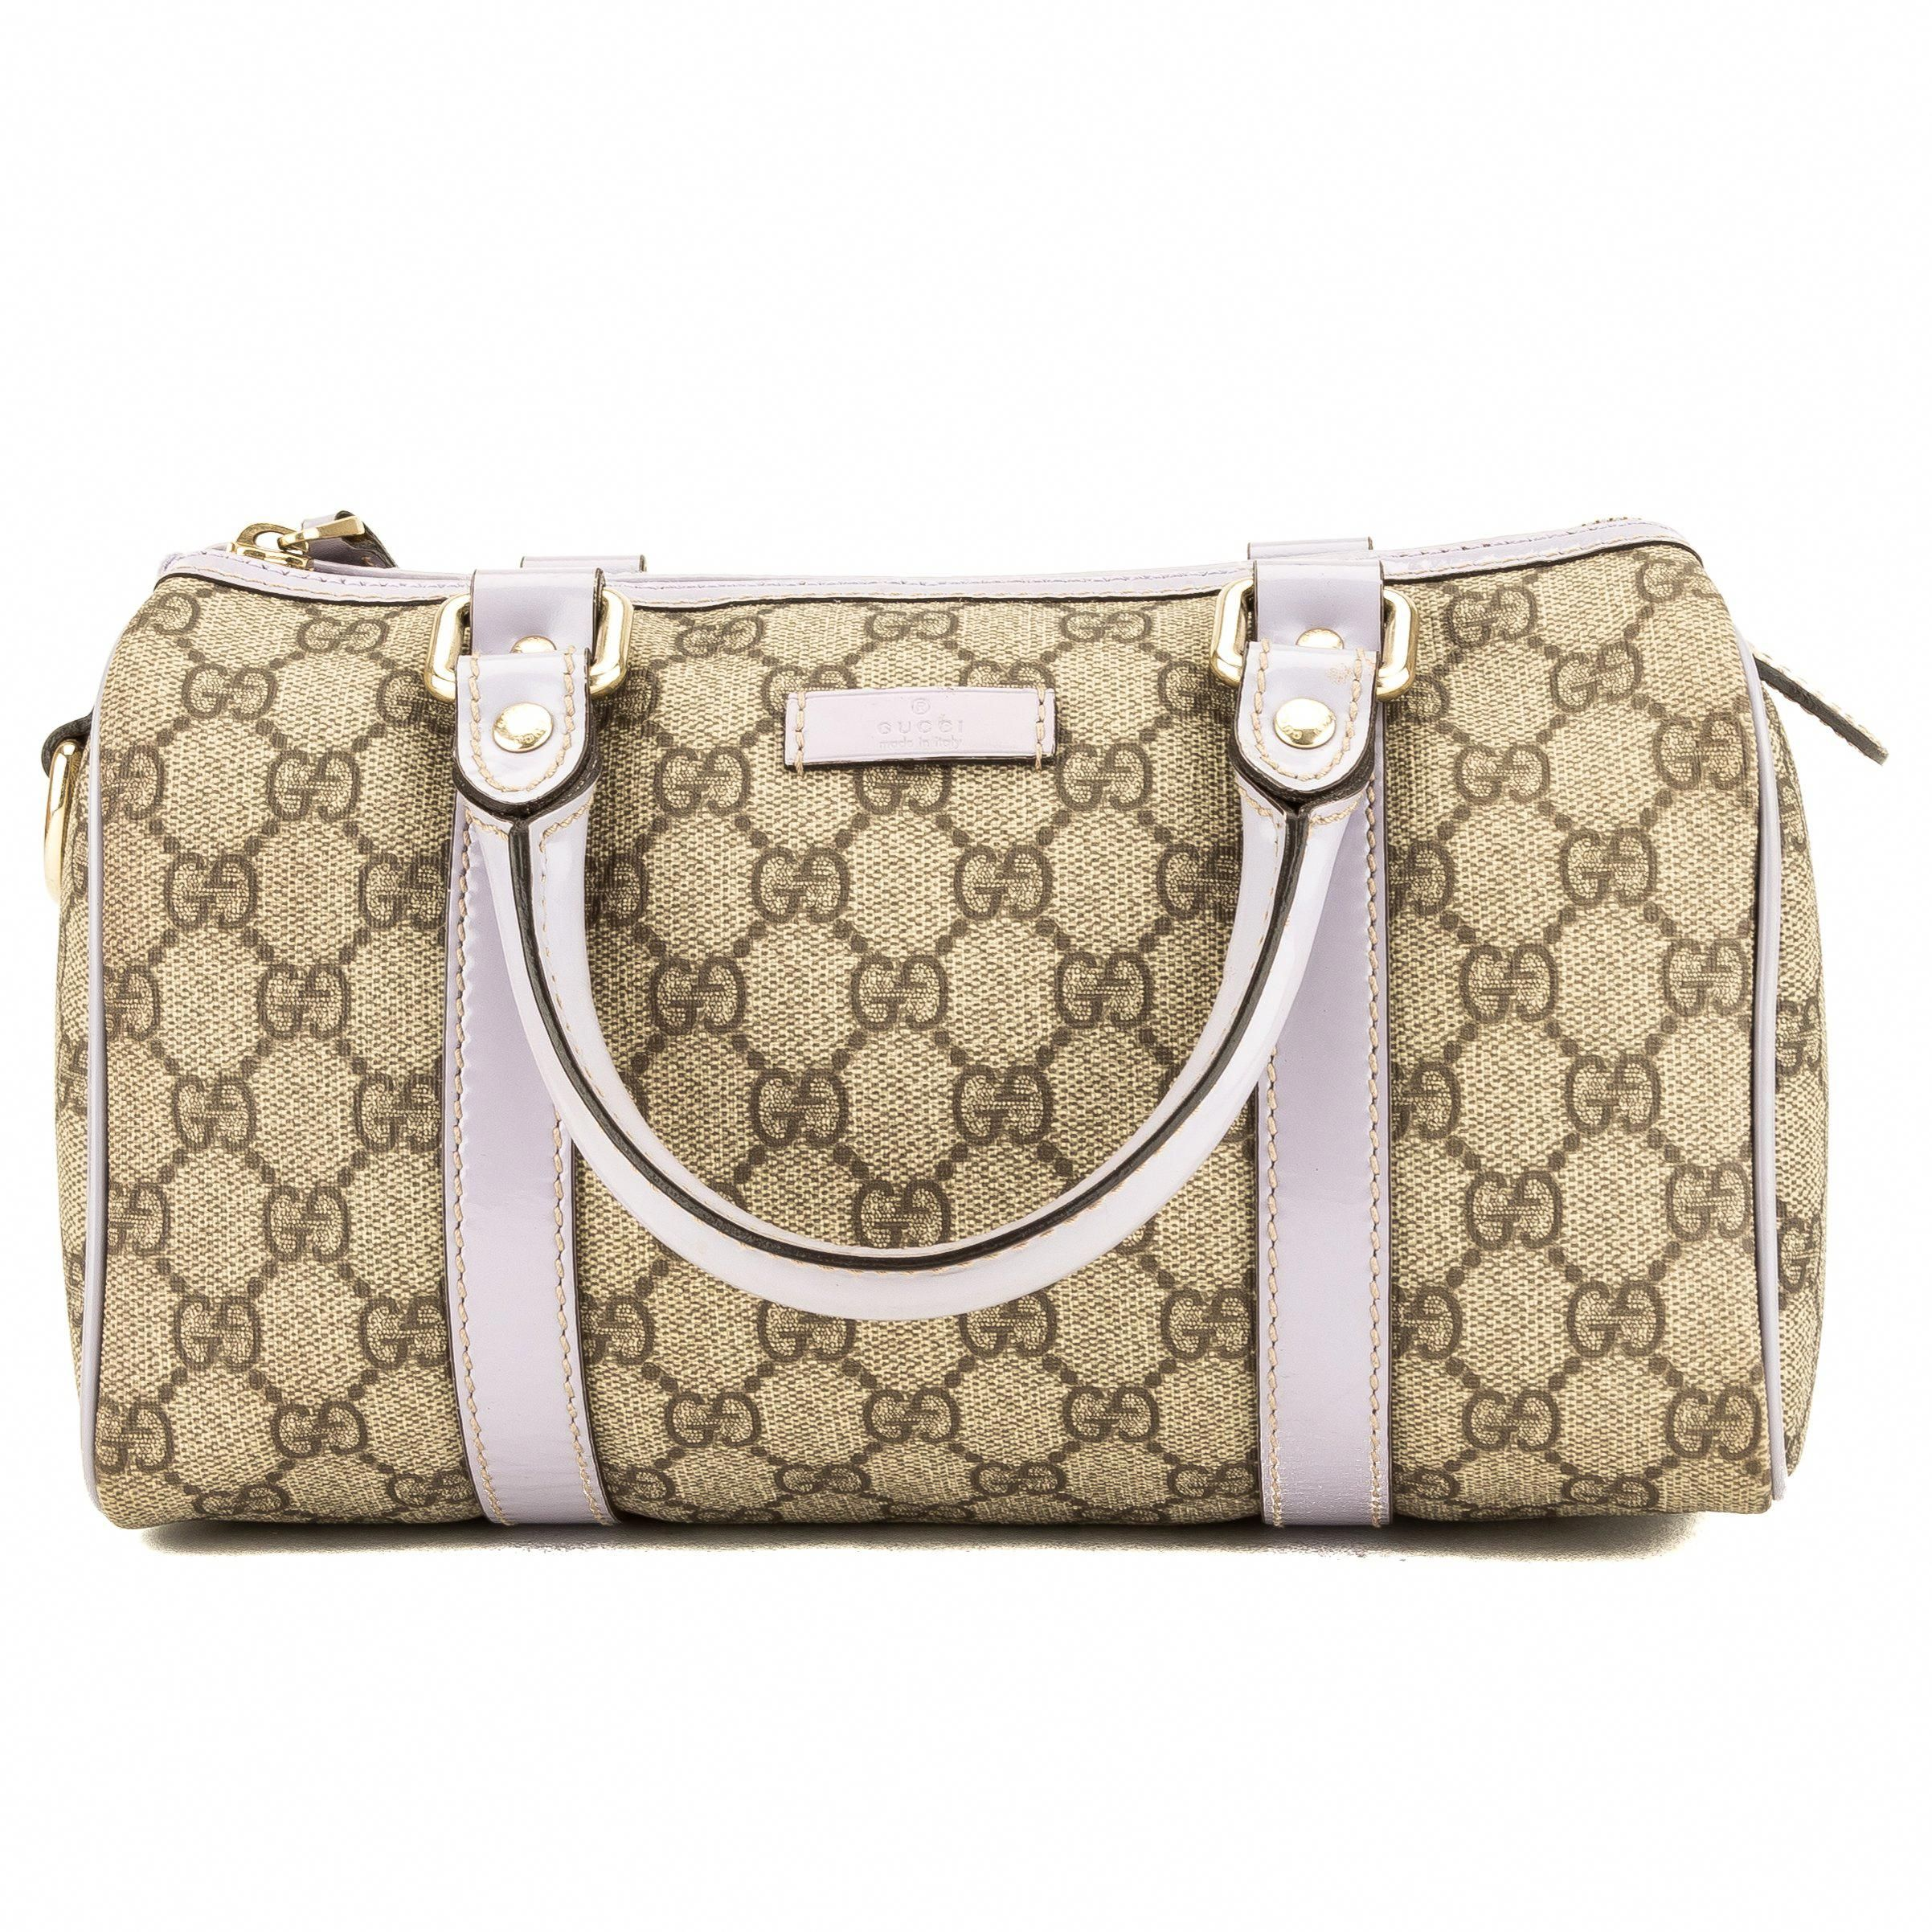 4ccc96d2d86 Gucci Lavender Leather GG Small Joy Boston (3956010) #Guccihandbags ...